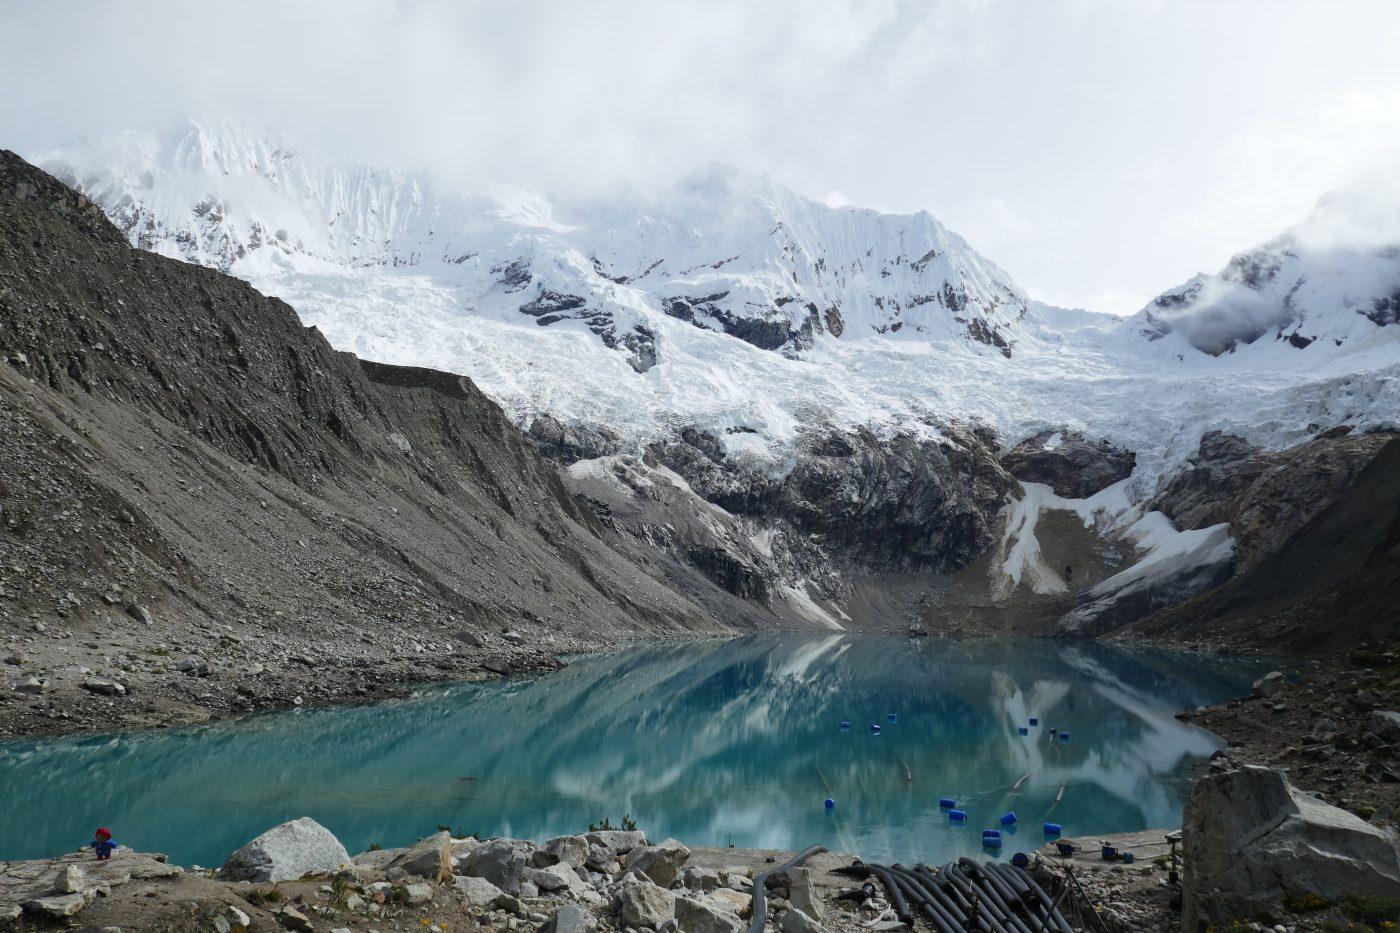 Lake Palcacocha